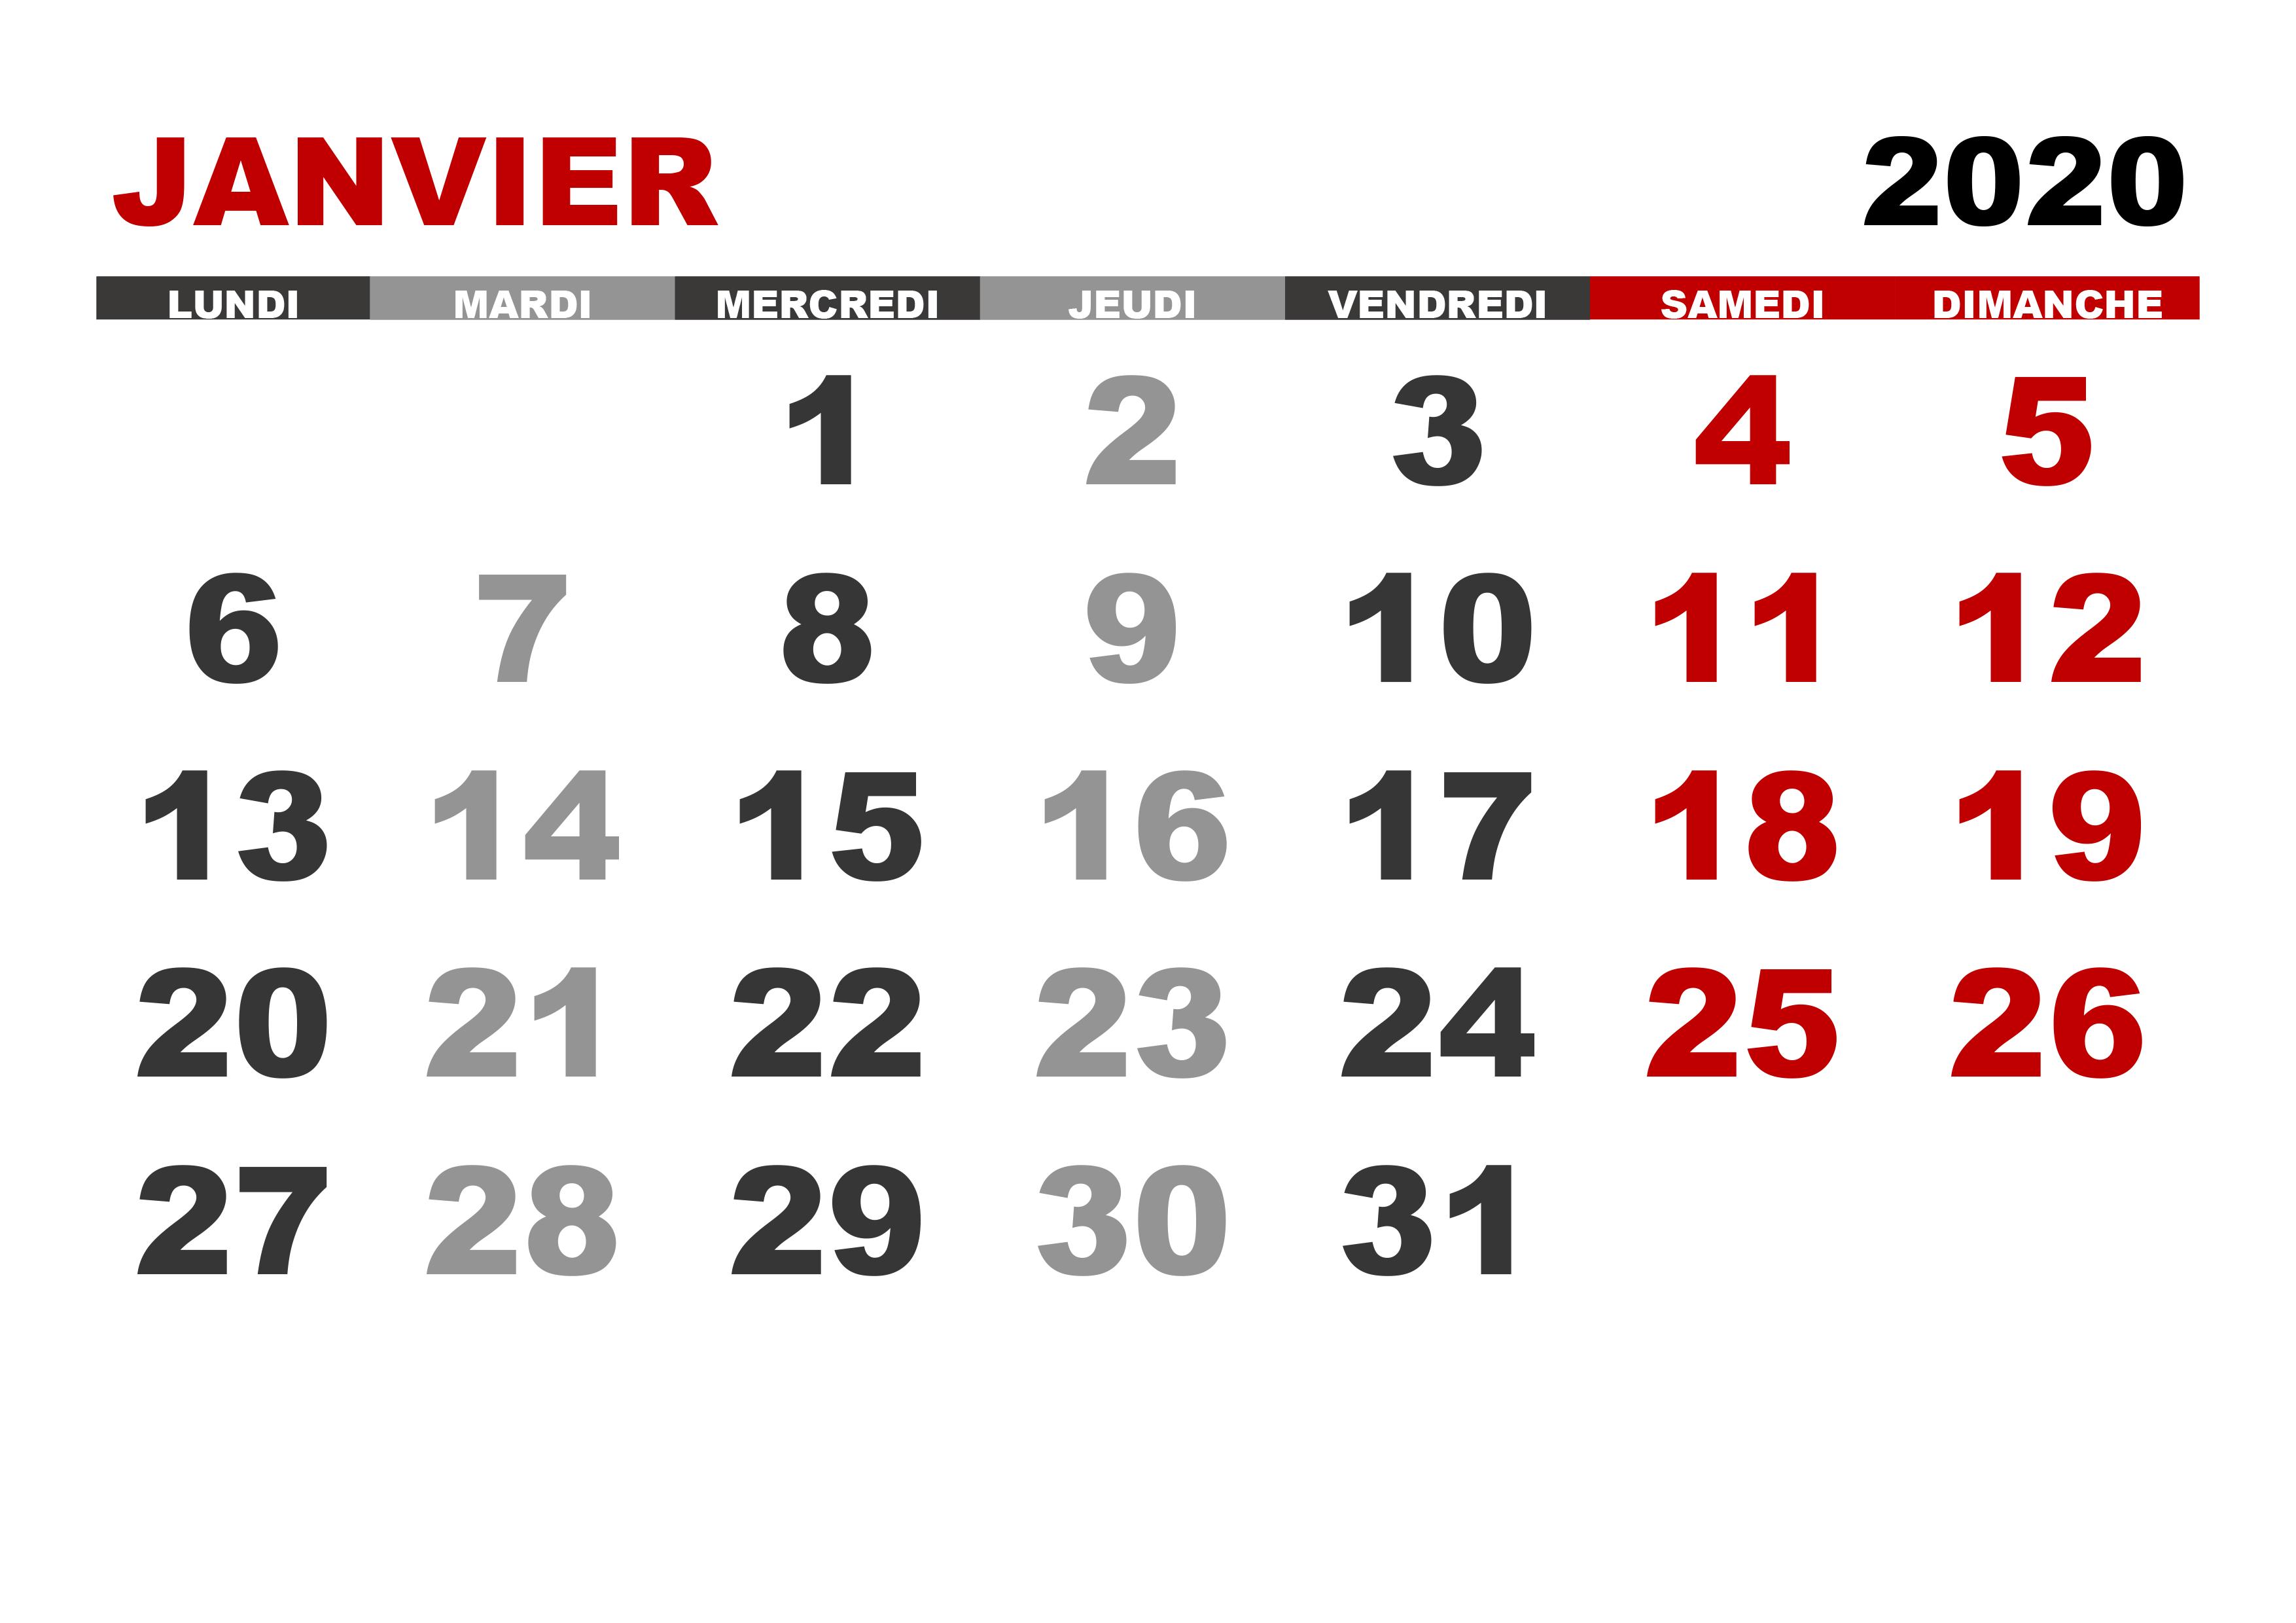 Calendrier Janvier 2020.Calendrier Janvier 2020 Pdf Imprimable Nosovia Com